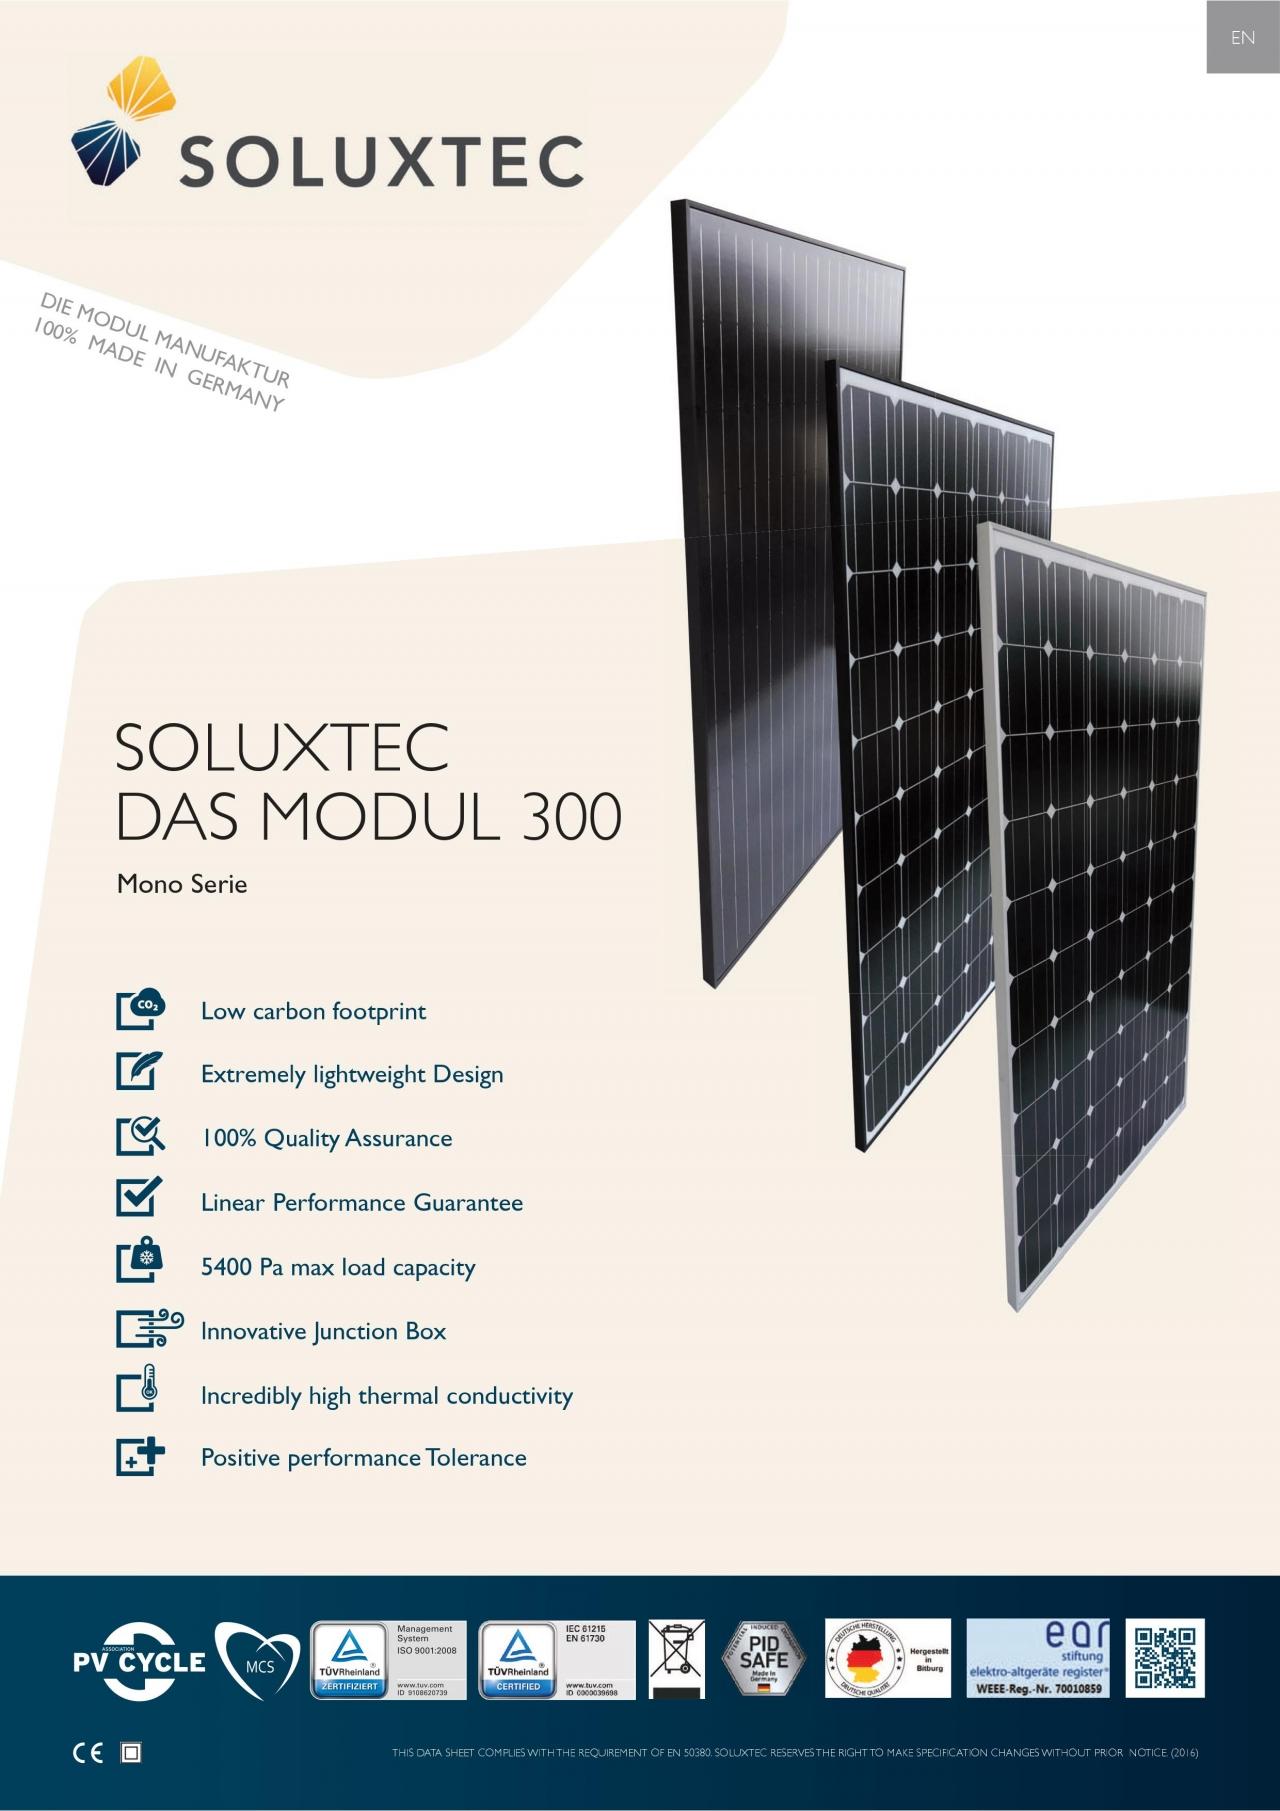 soluxtec gmbh solar panels germany. Black Bedroom Furniture Sets. Home Design Ideas